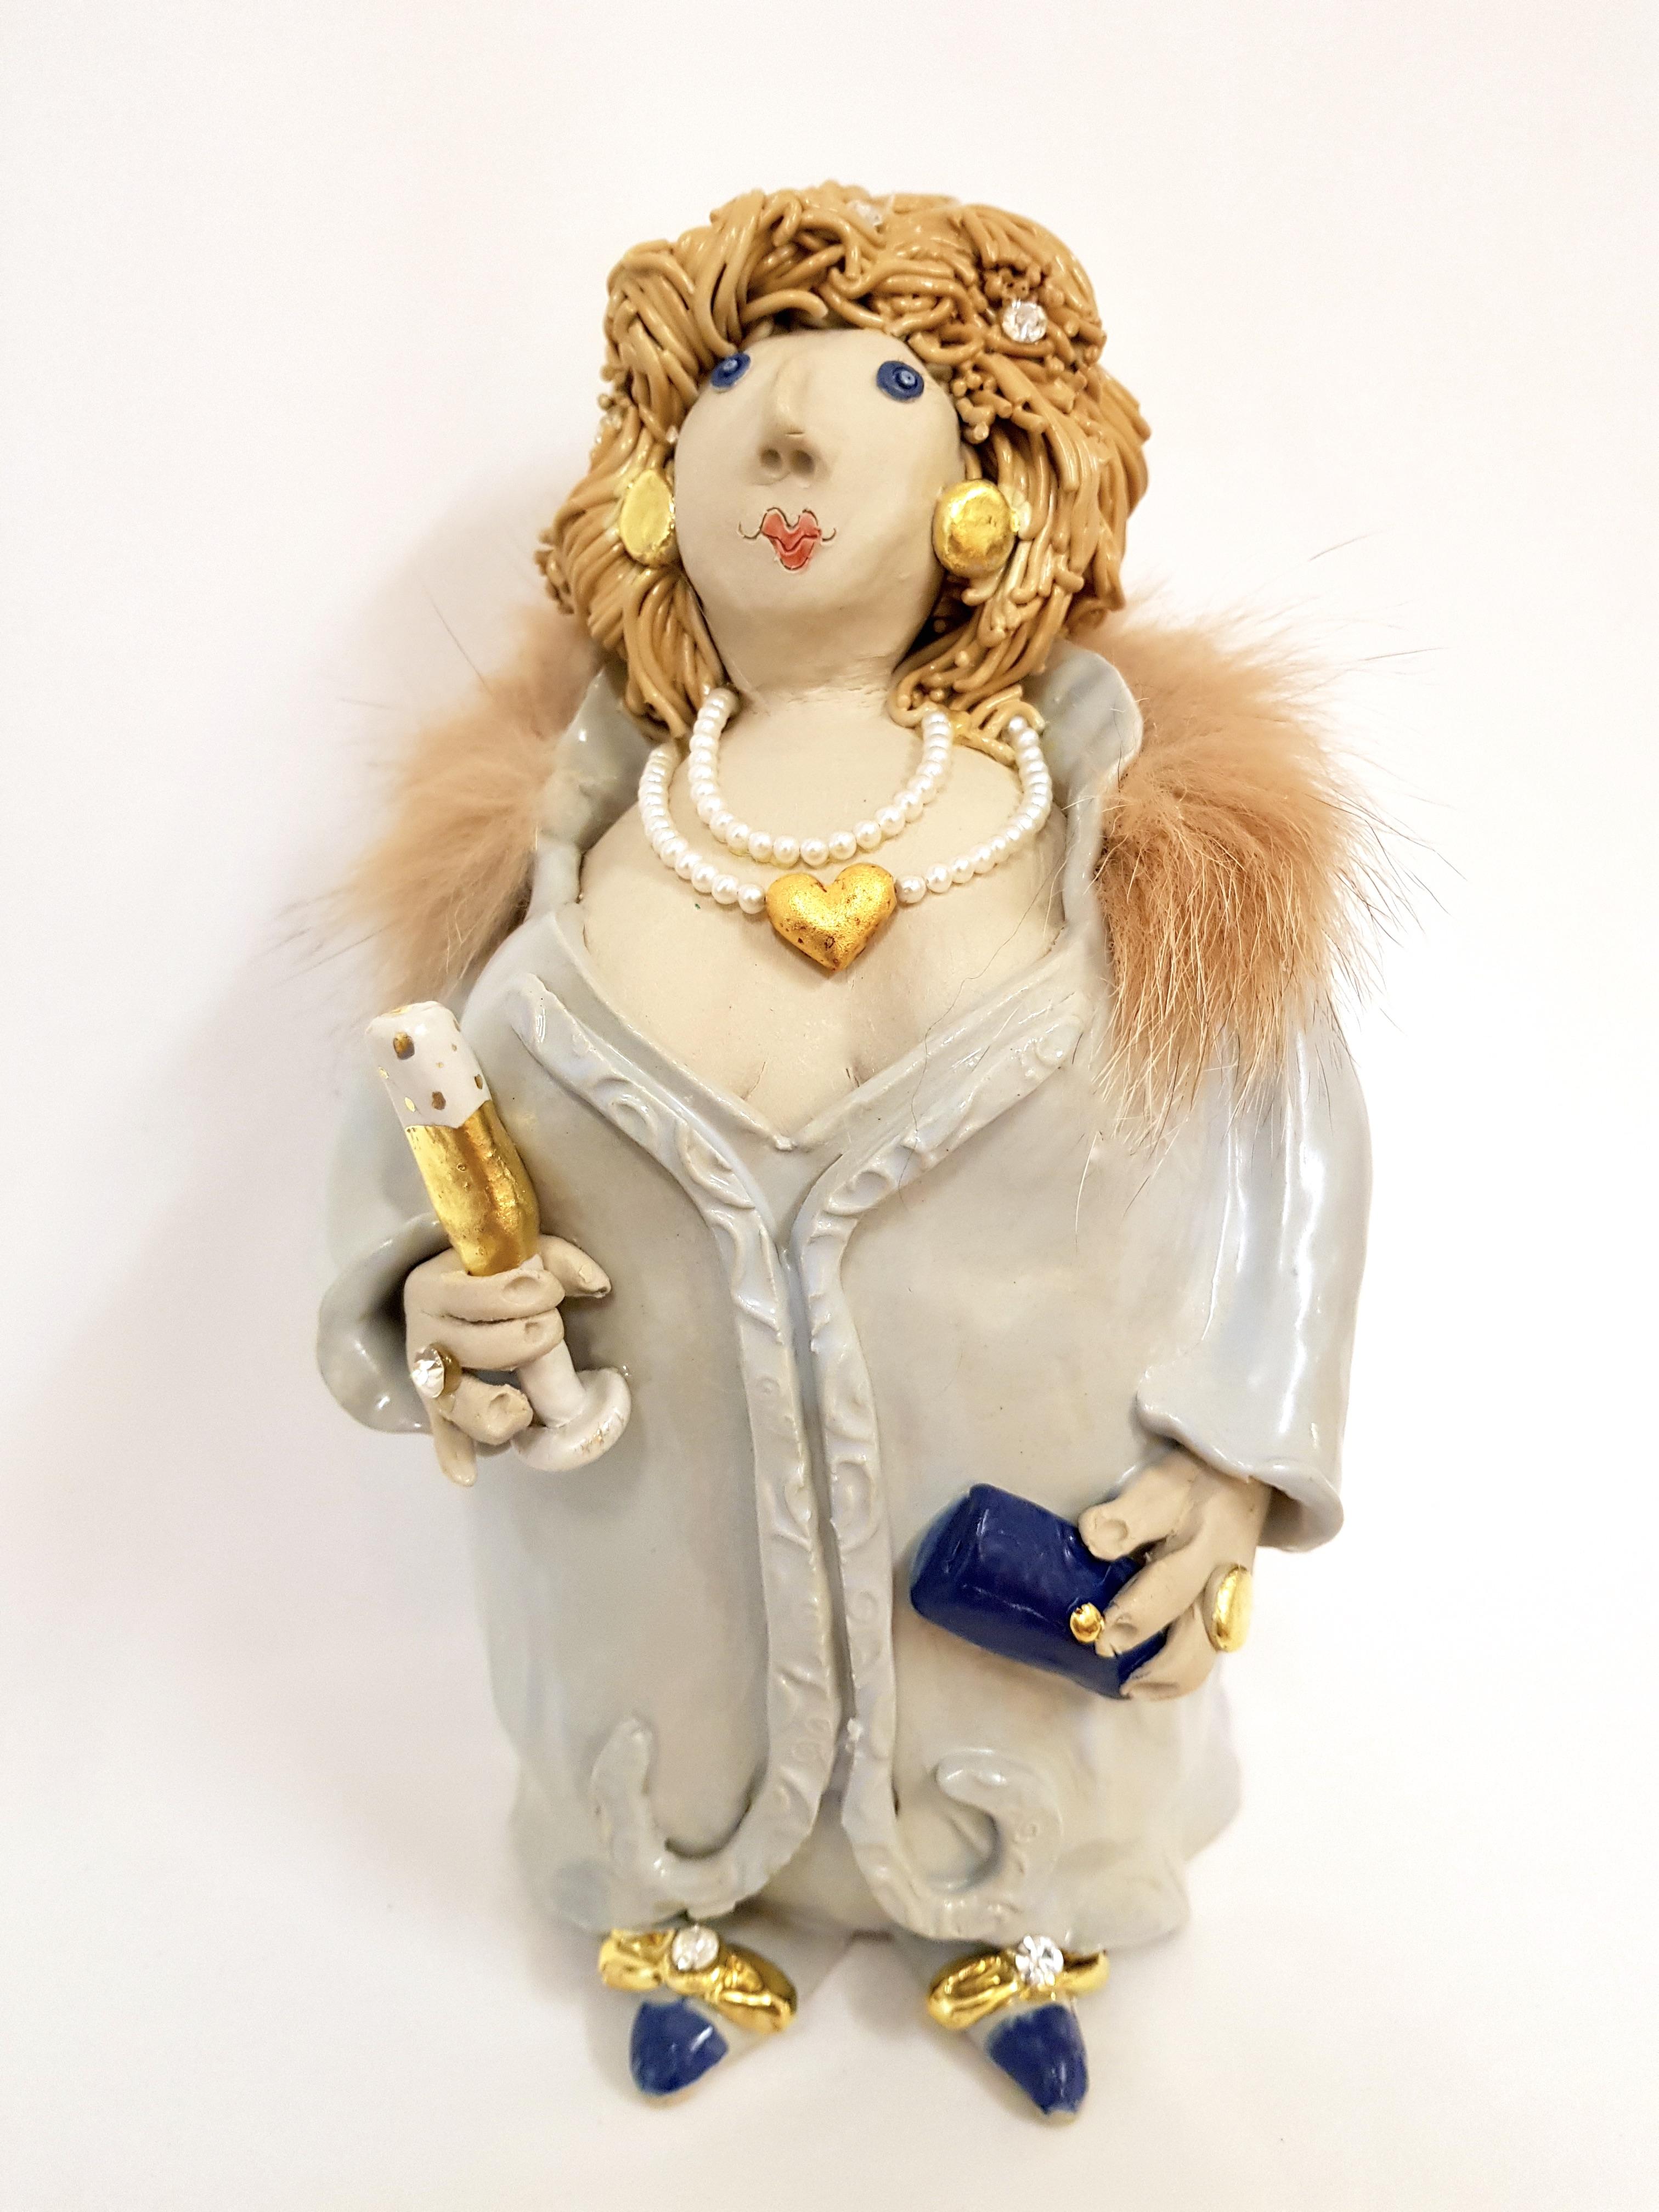 Diva Babyblue, Töpferei la Ceramica Basel, Unikat, Keramik, Frauenpower, Töpferkurse, Teamevent